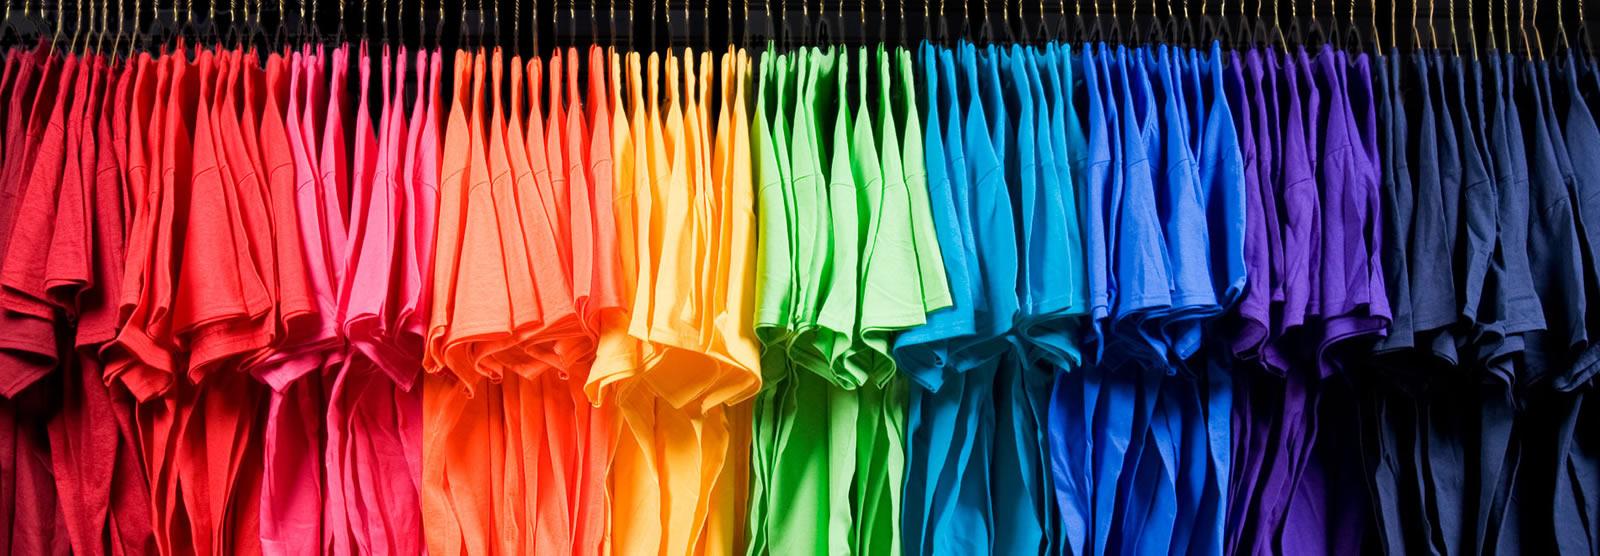 Tisk na tekstil